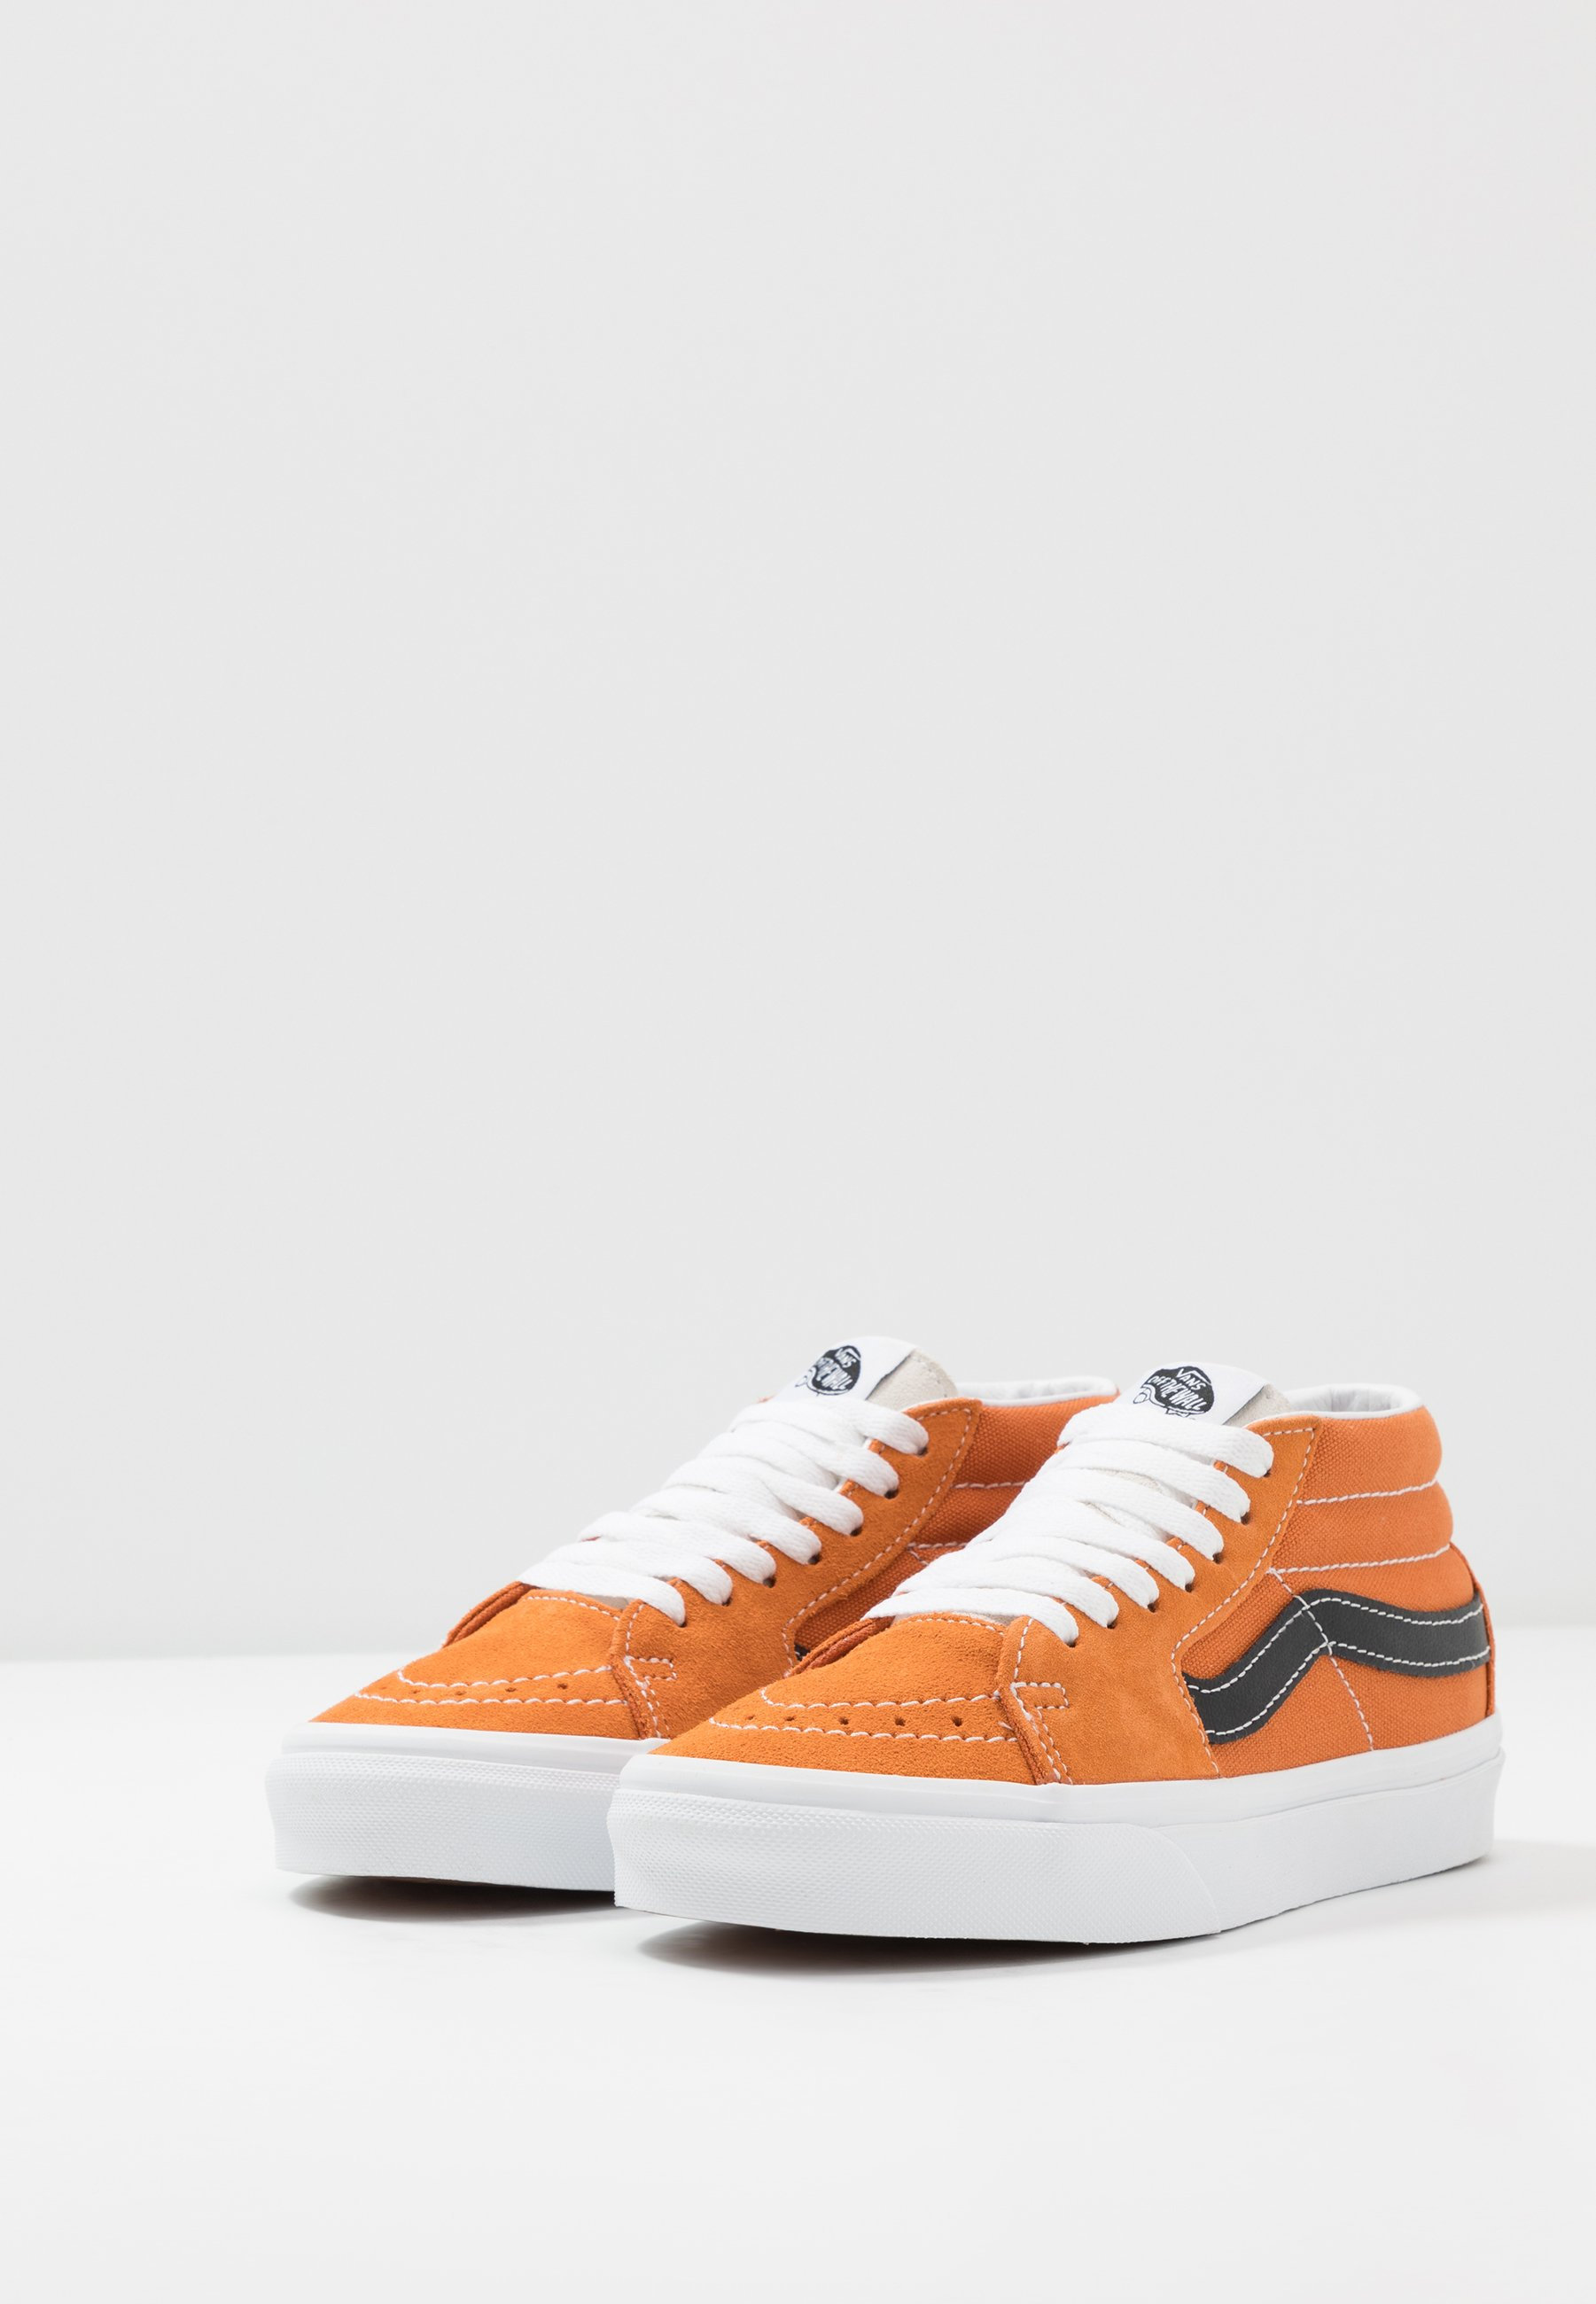 SK8 MID Höga sneakers apricot bufftrue white